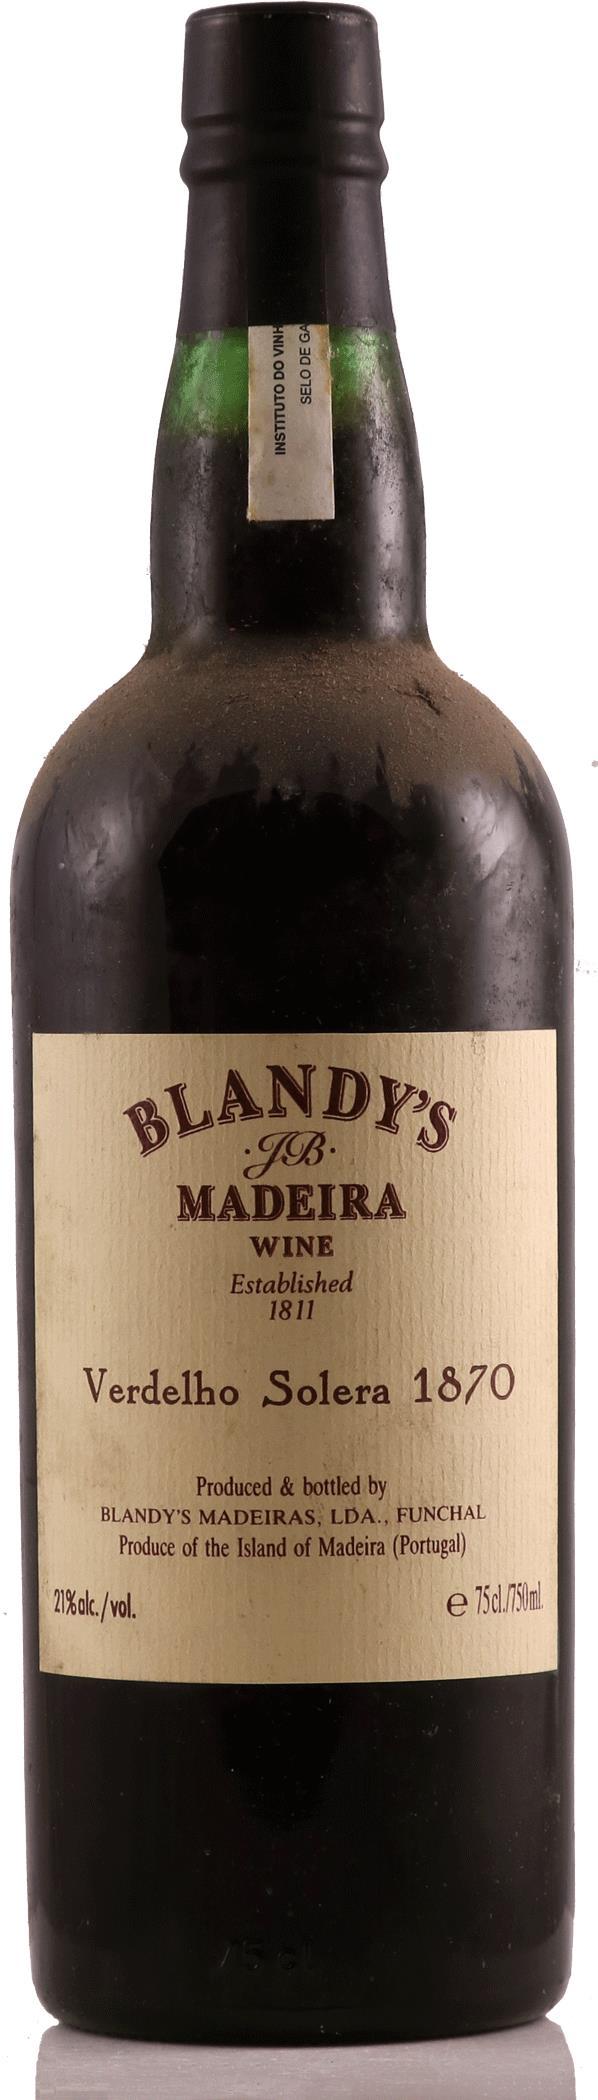 Madeira 1870 Blandys